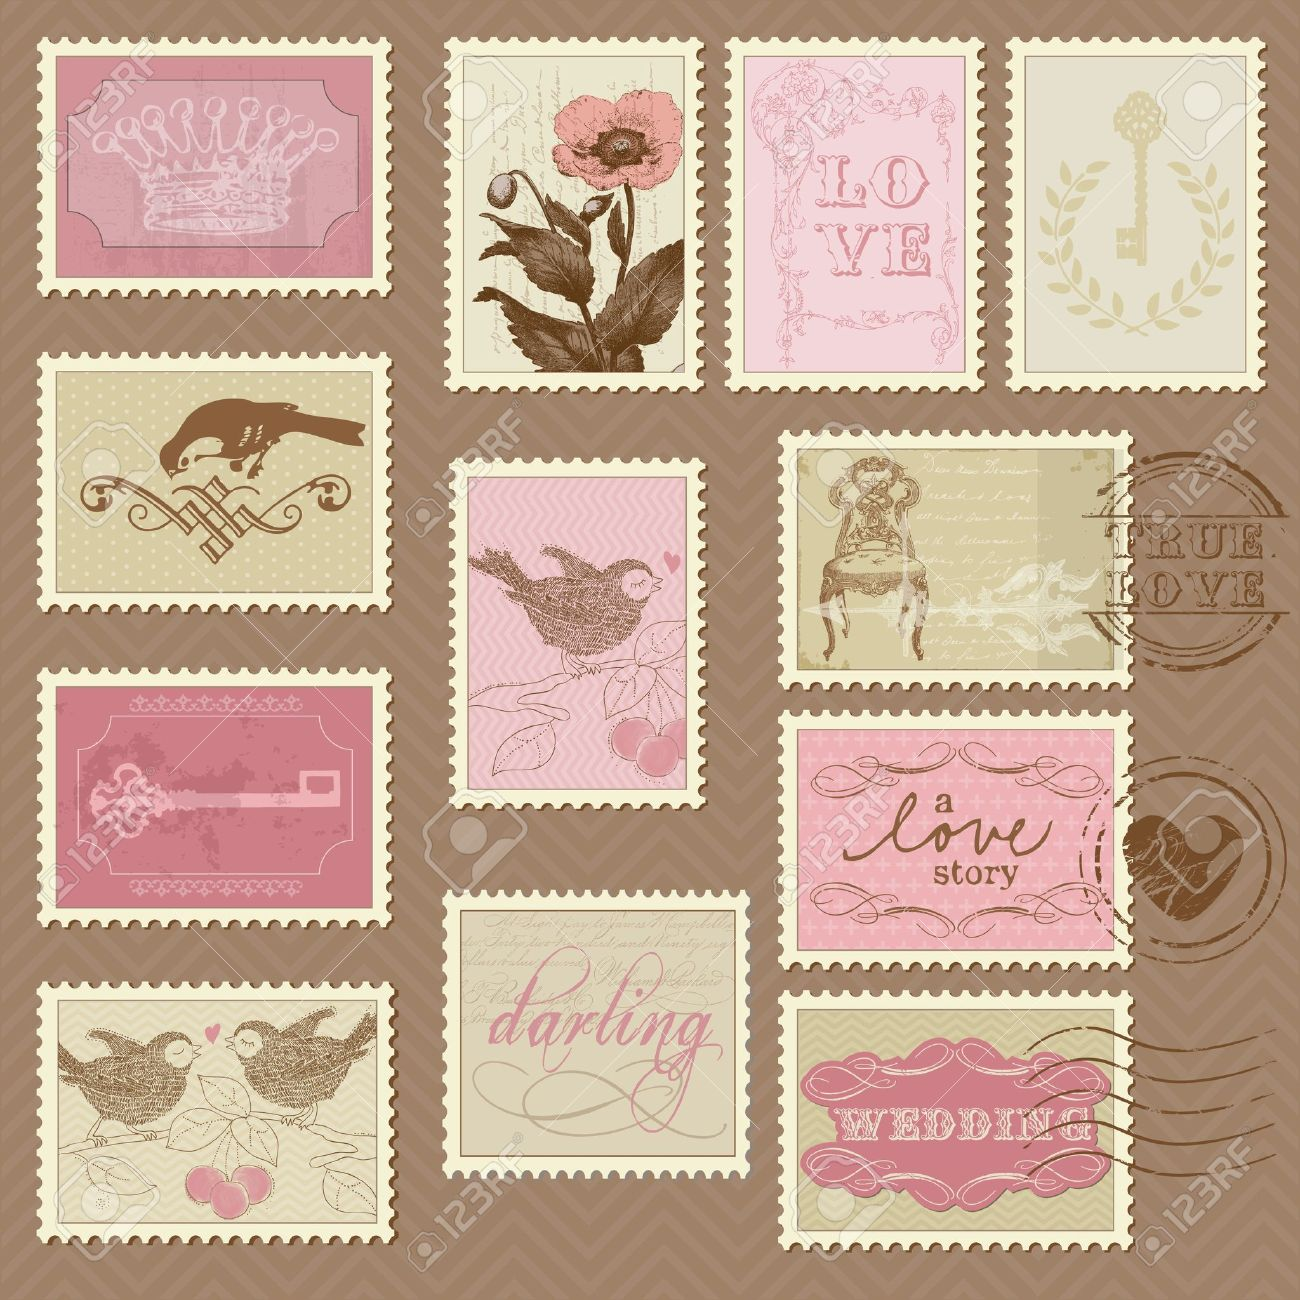 How to scrapbook a wedding invitation - Retro Postage Stamps For Wedding Design Invitation Congratulation Scrapbook Stock Vector